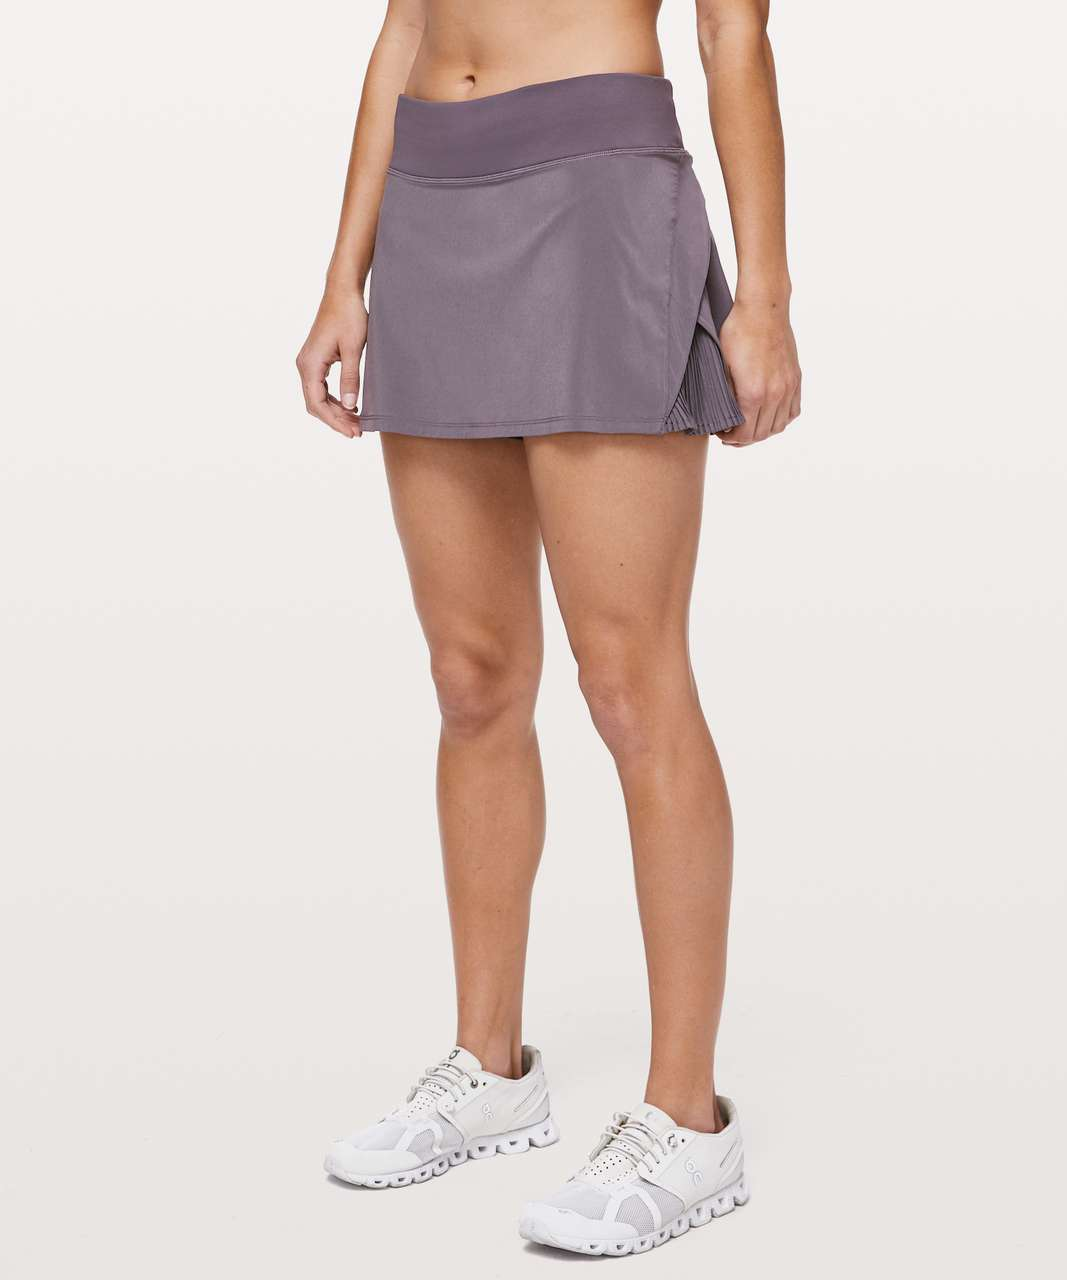 "Lululemon Play Off The Pleats Skirt *13"" - Graphite Purple"